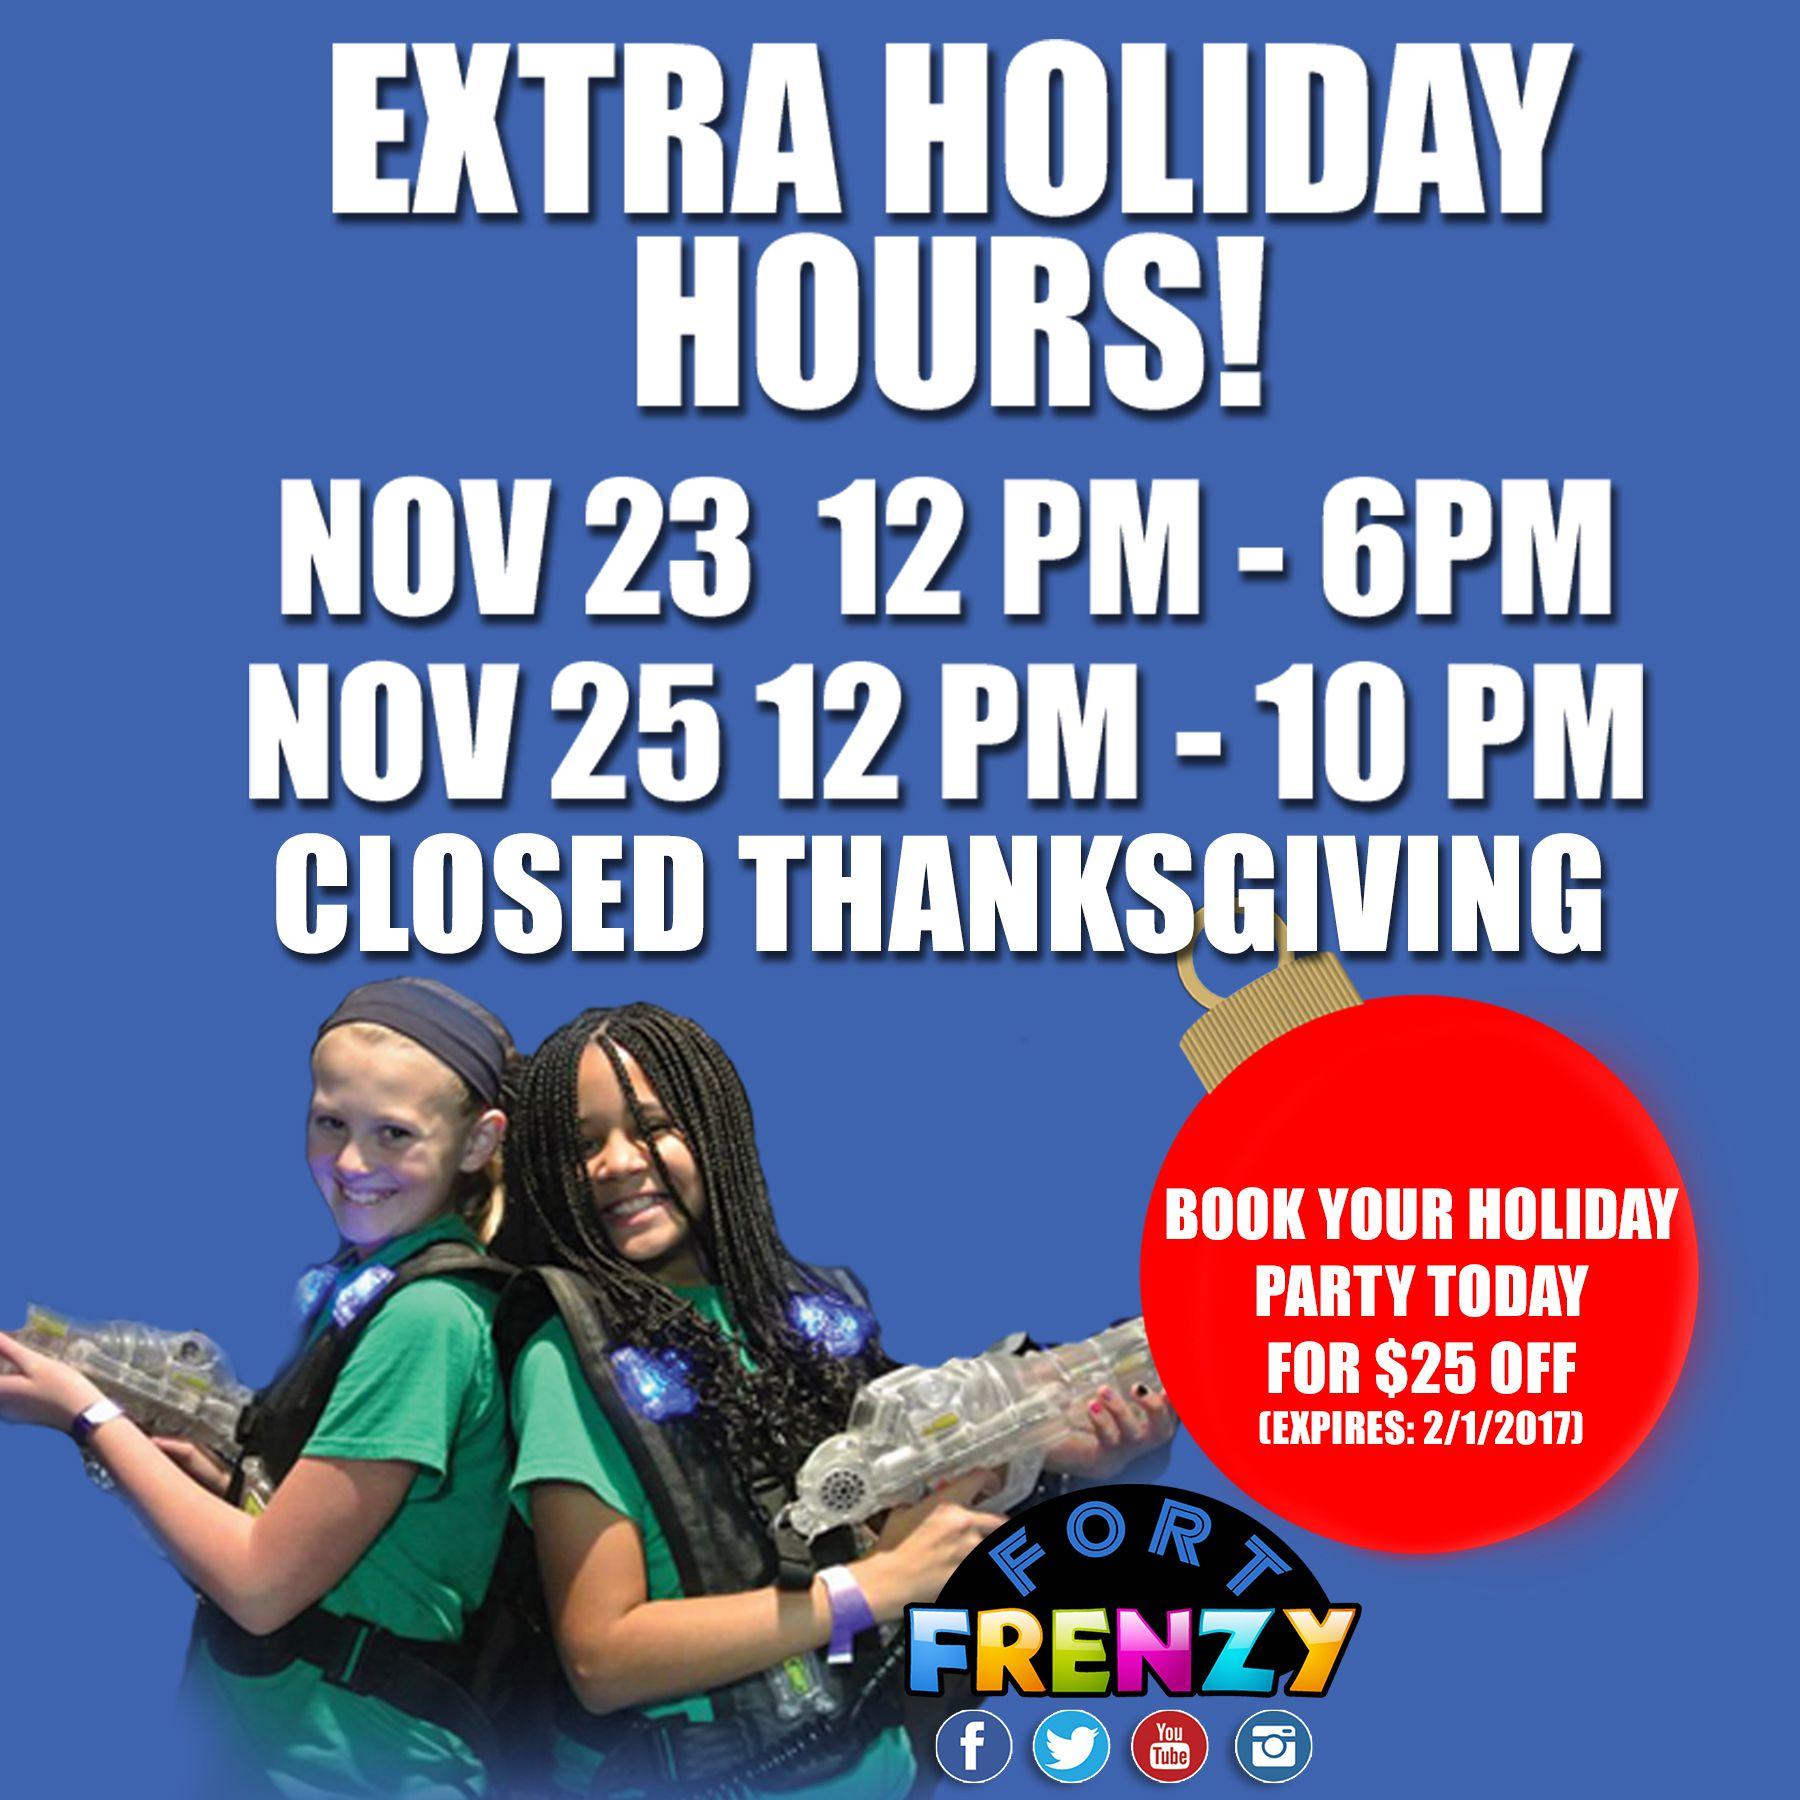 FF Holiday Hours.jpg